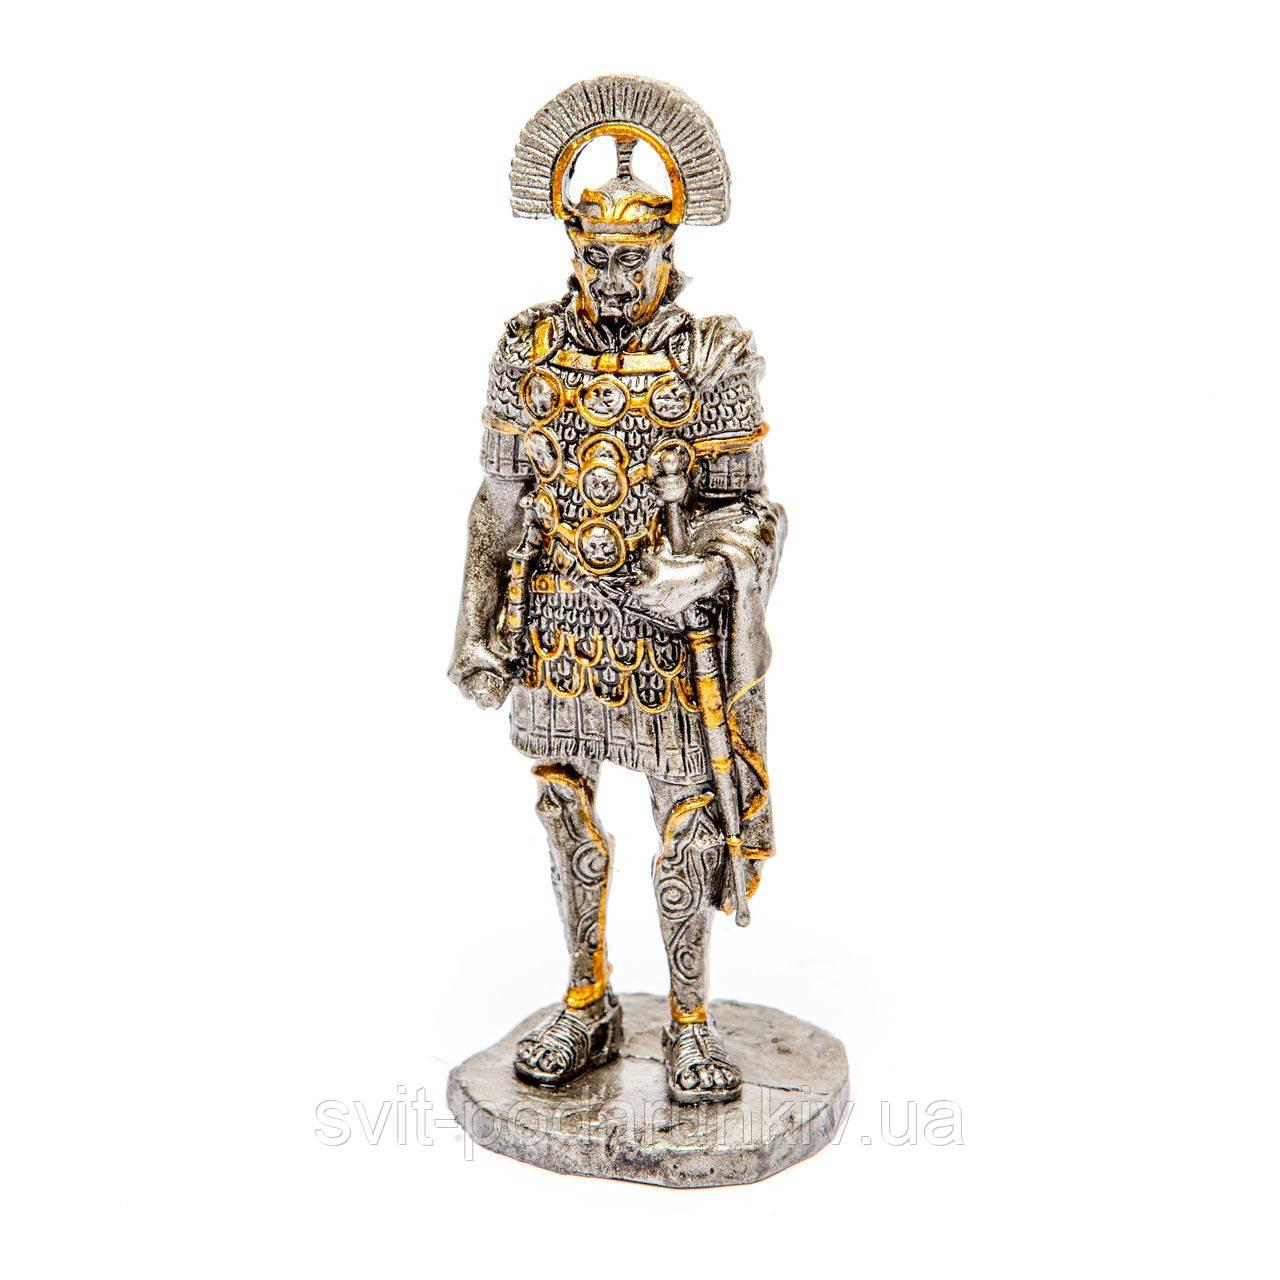 Статуэтка воина римского полководца Центурион HHSH016